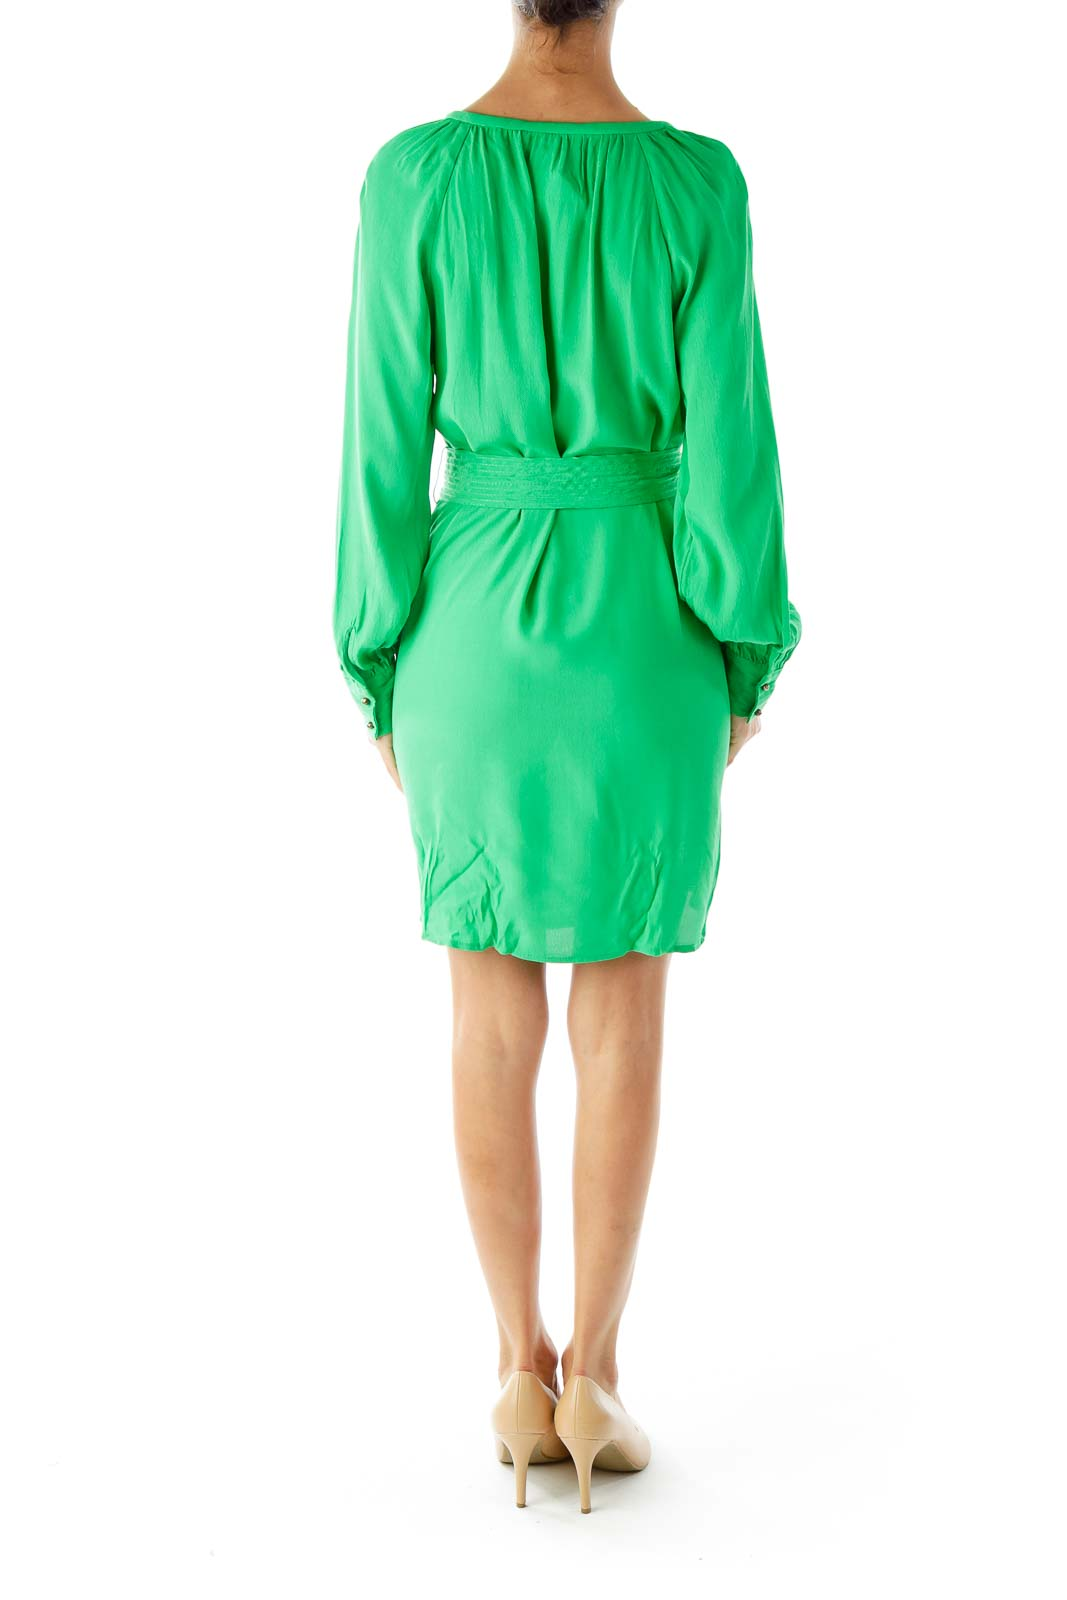 Green Belted Dress